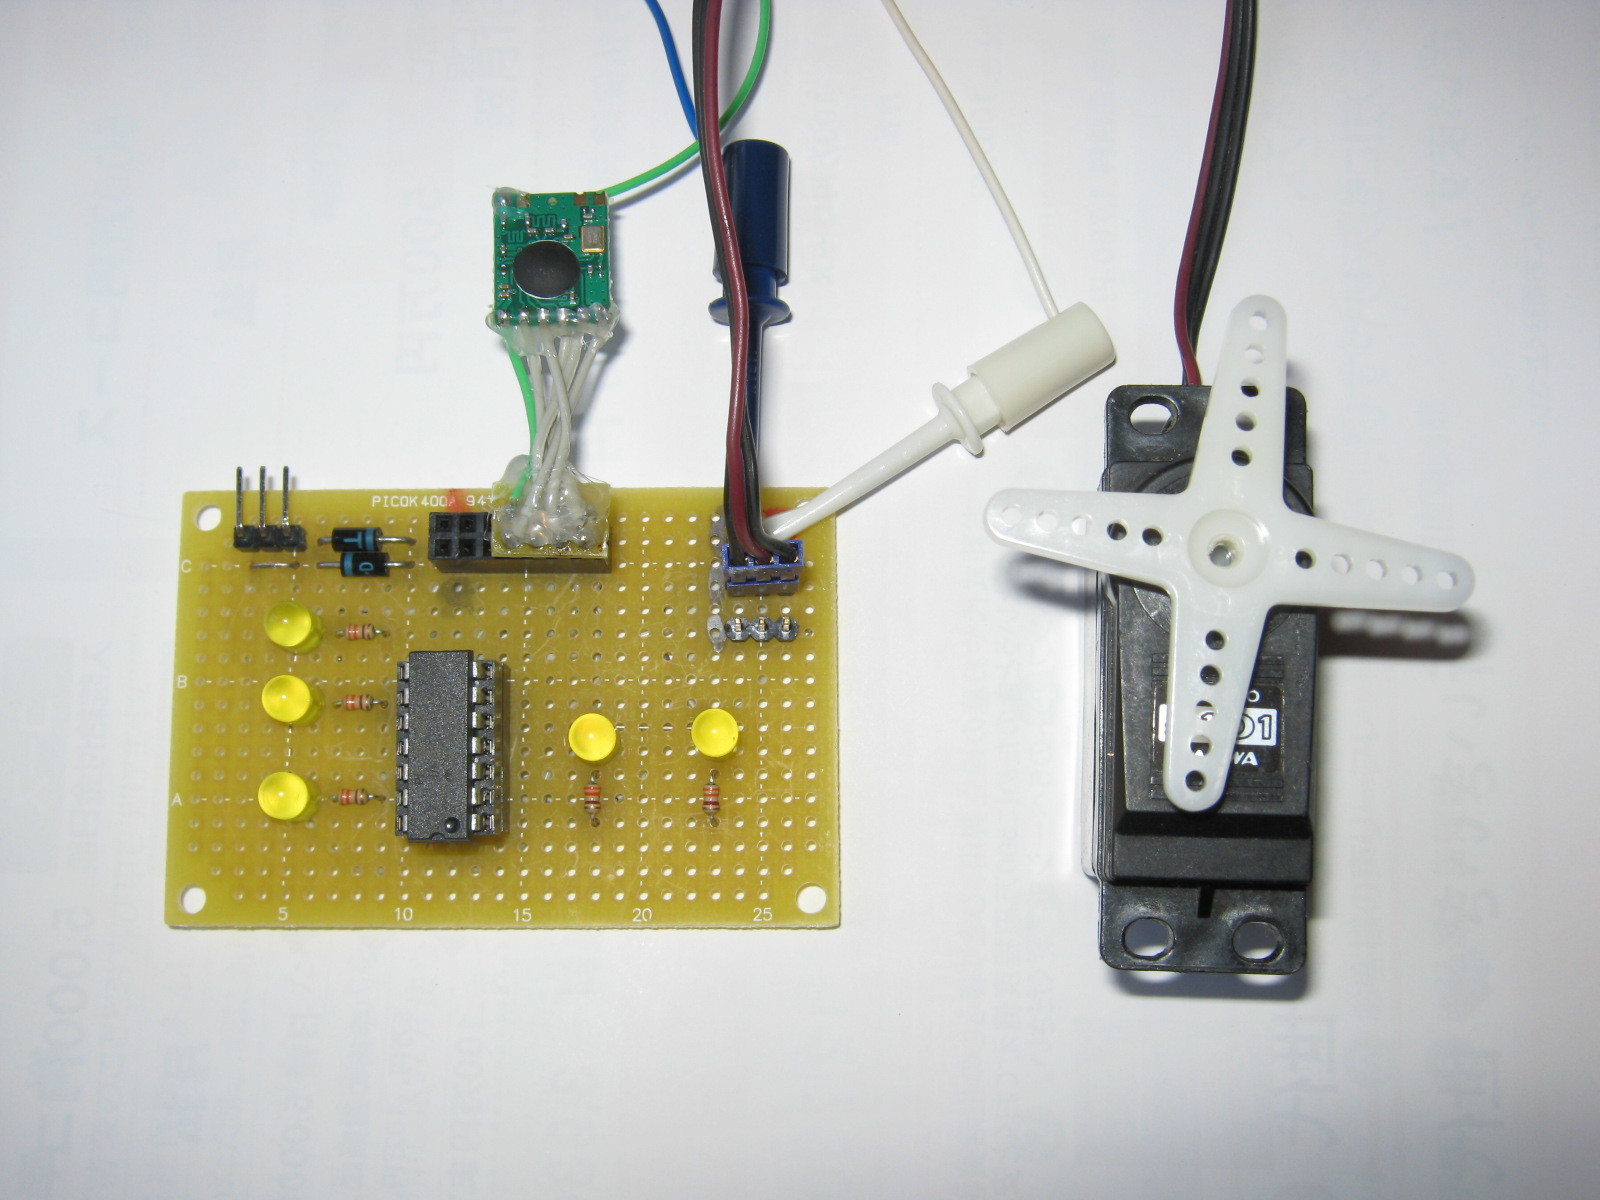 2.4GHzラジコン用ファームウェア製作(CC2500)受信側